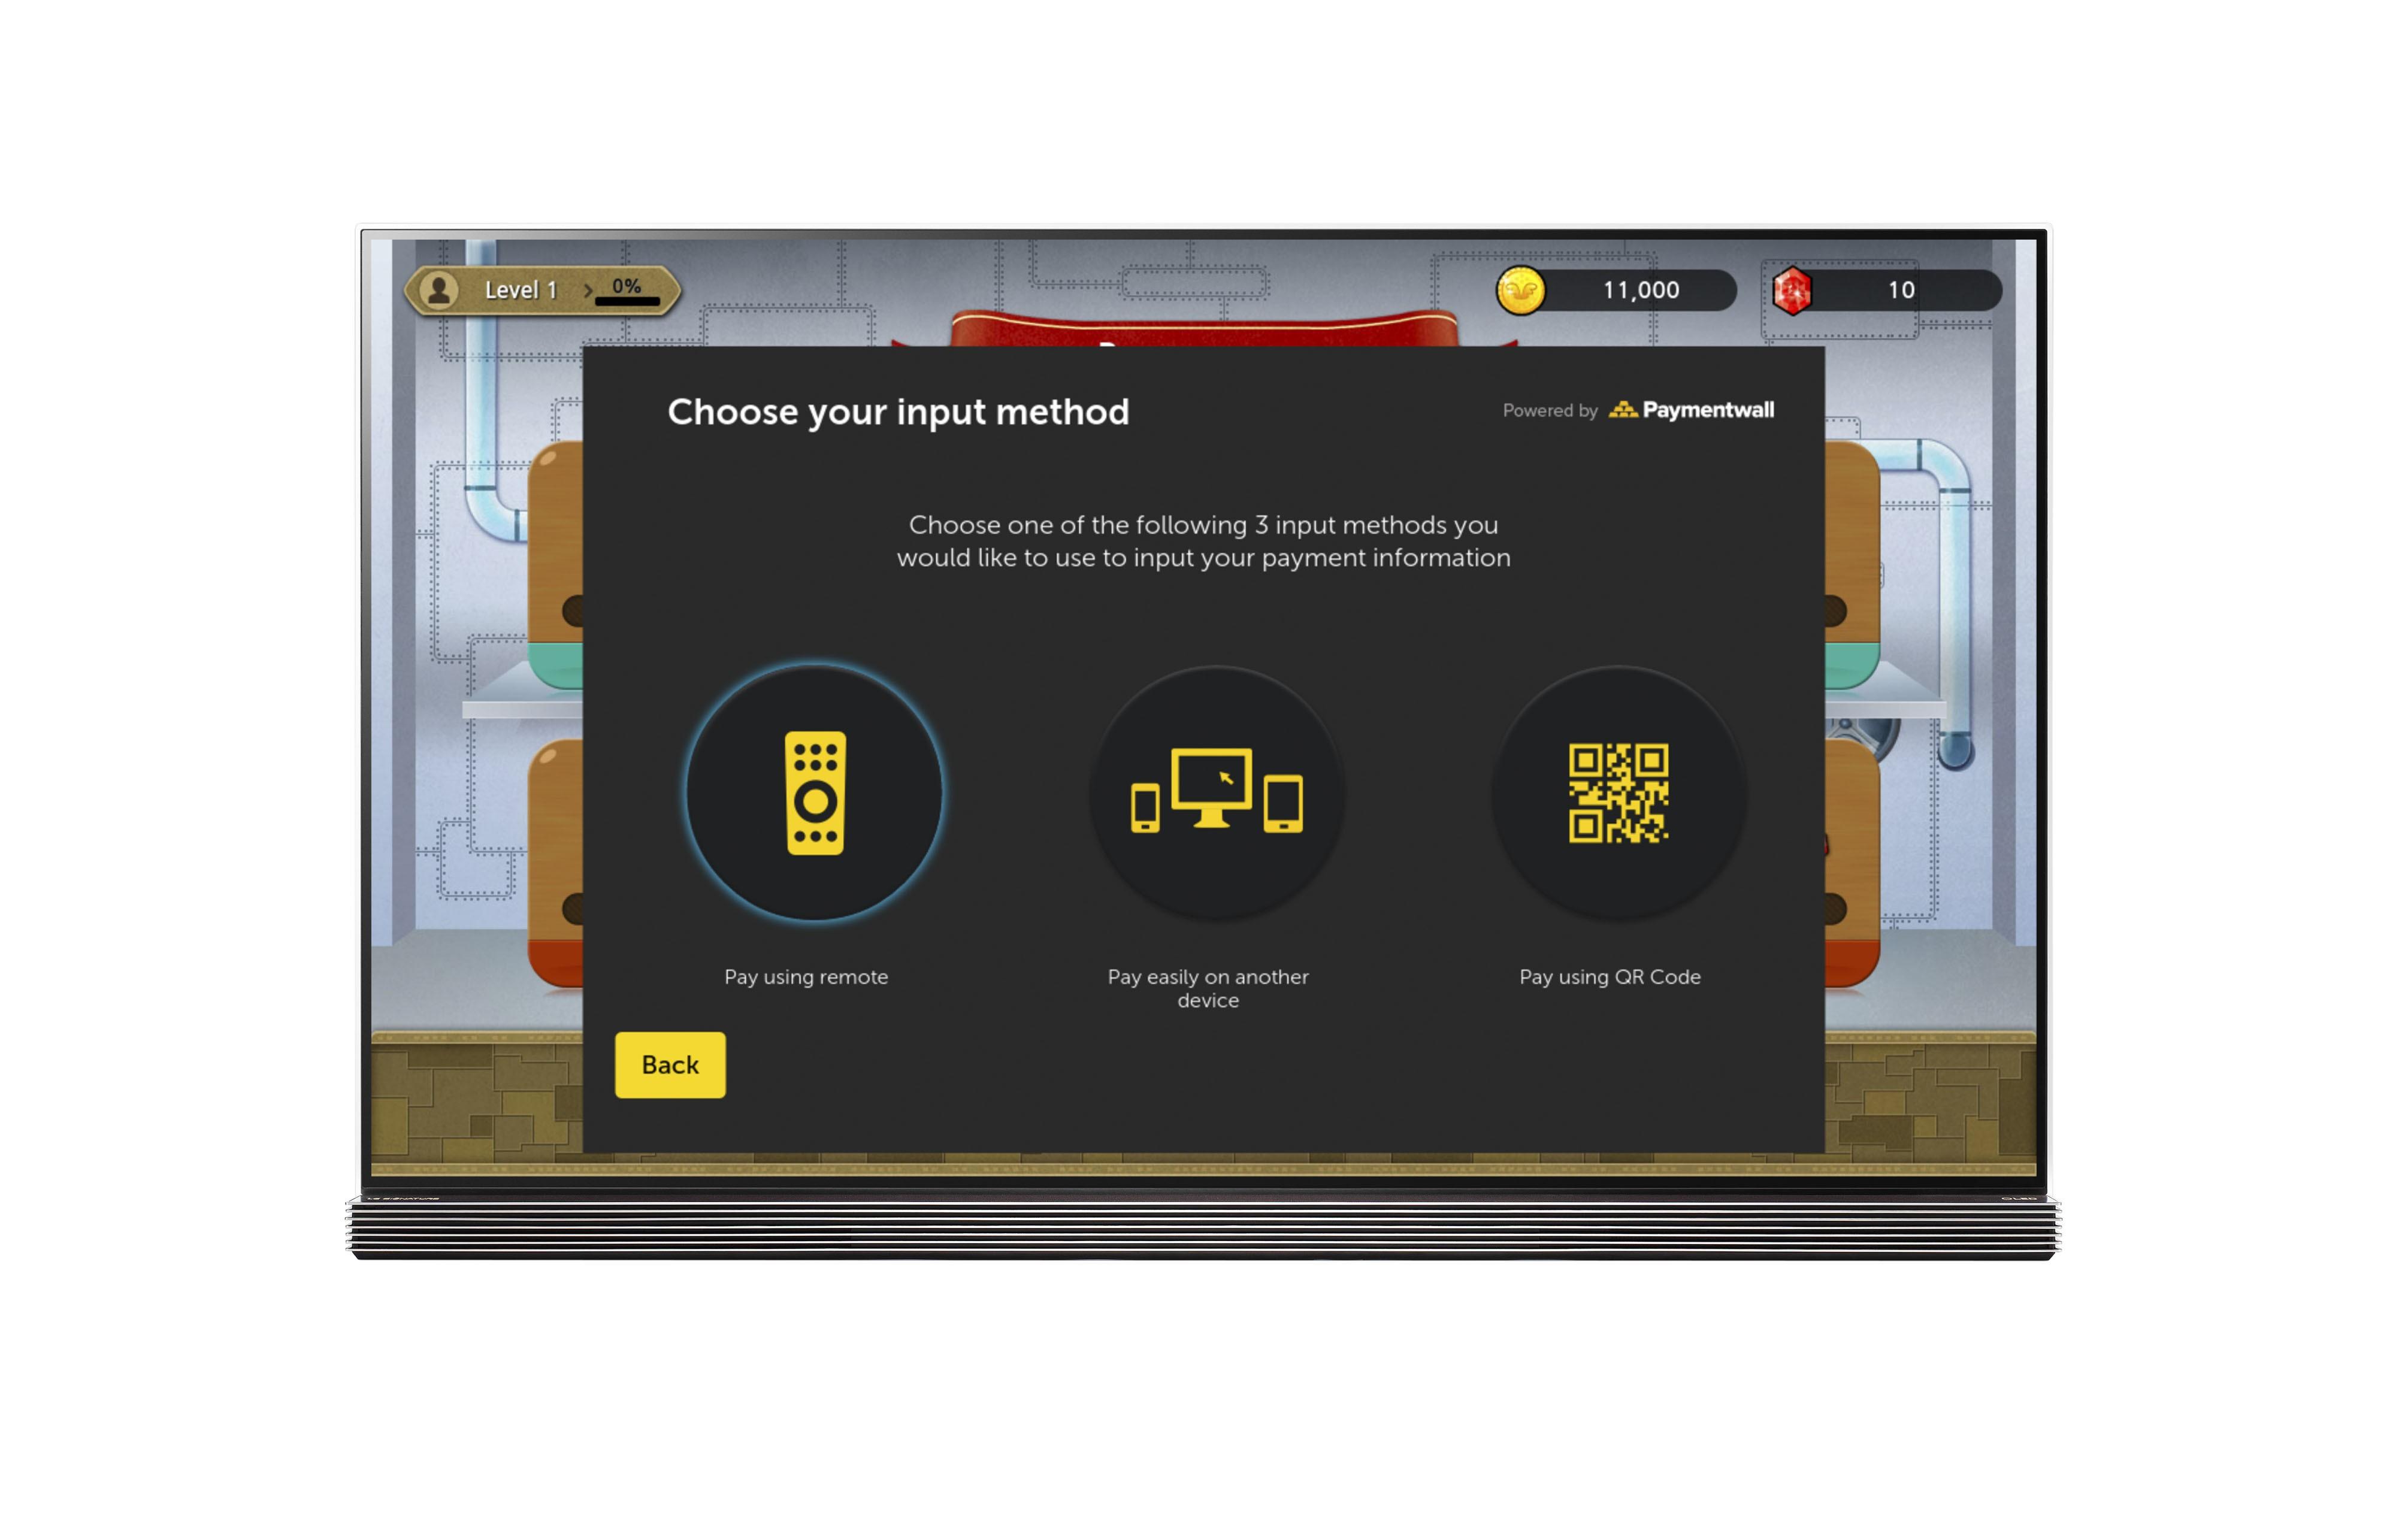 LG-Smart-TV-Payment-Parnership_120160930171906872